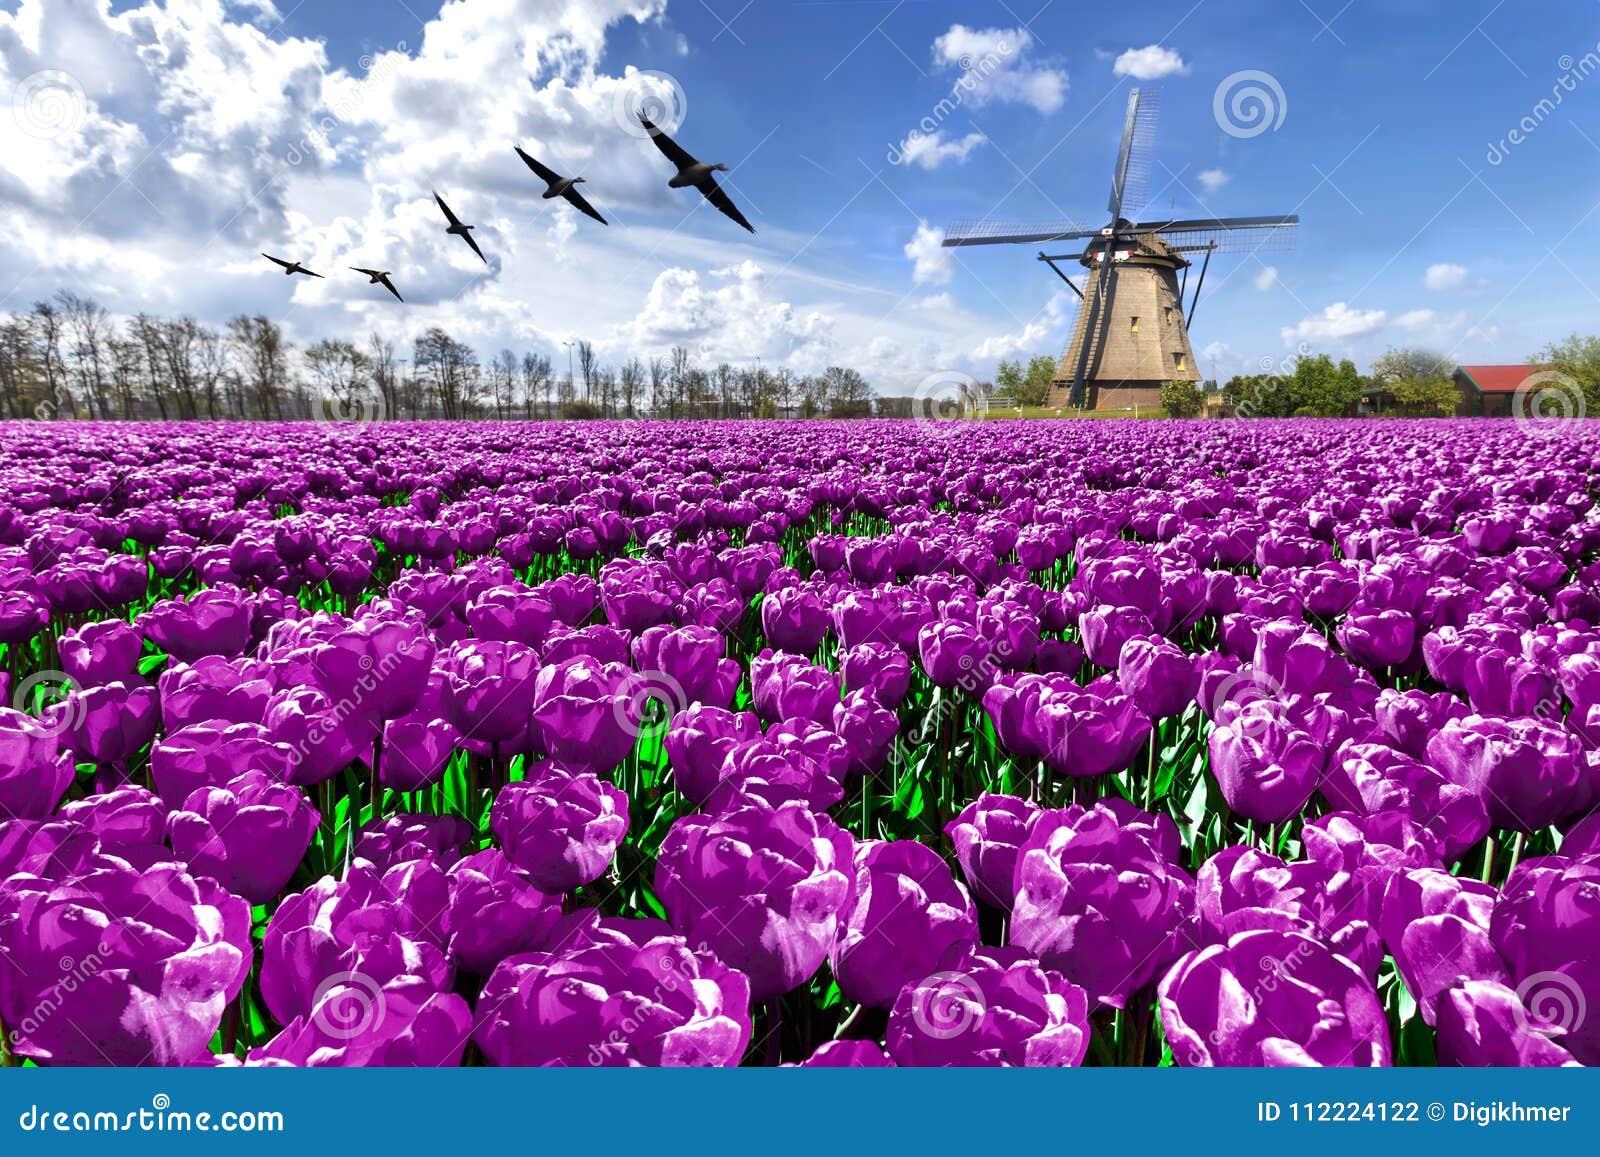 Dutch windmill spring landscape